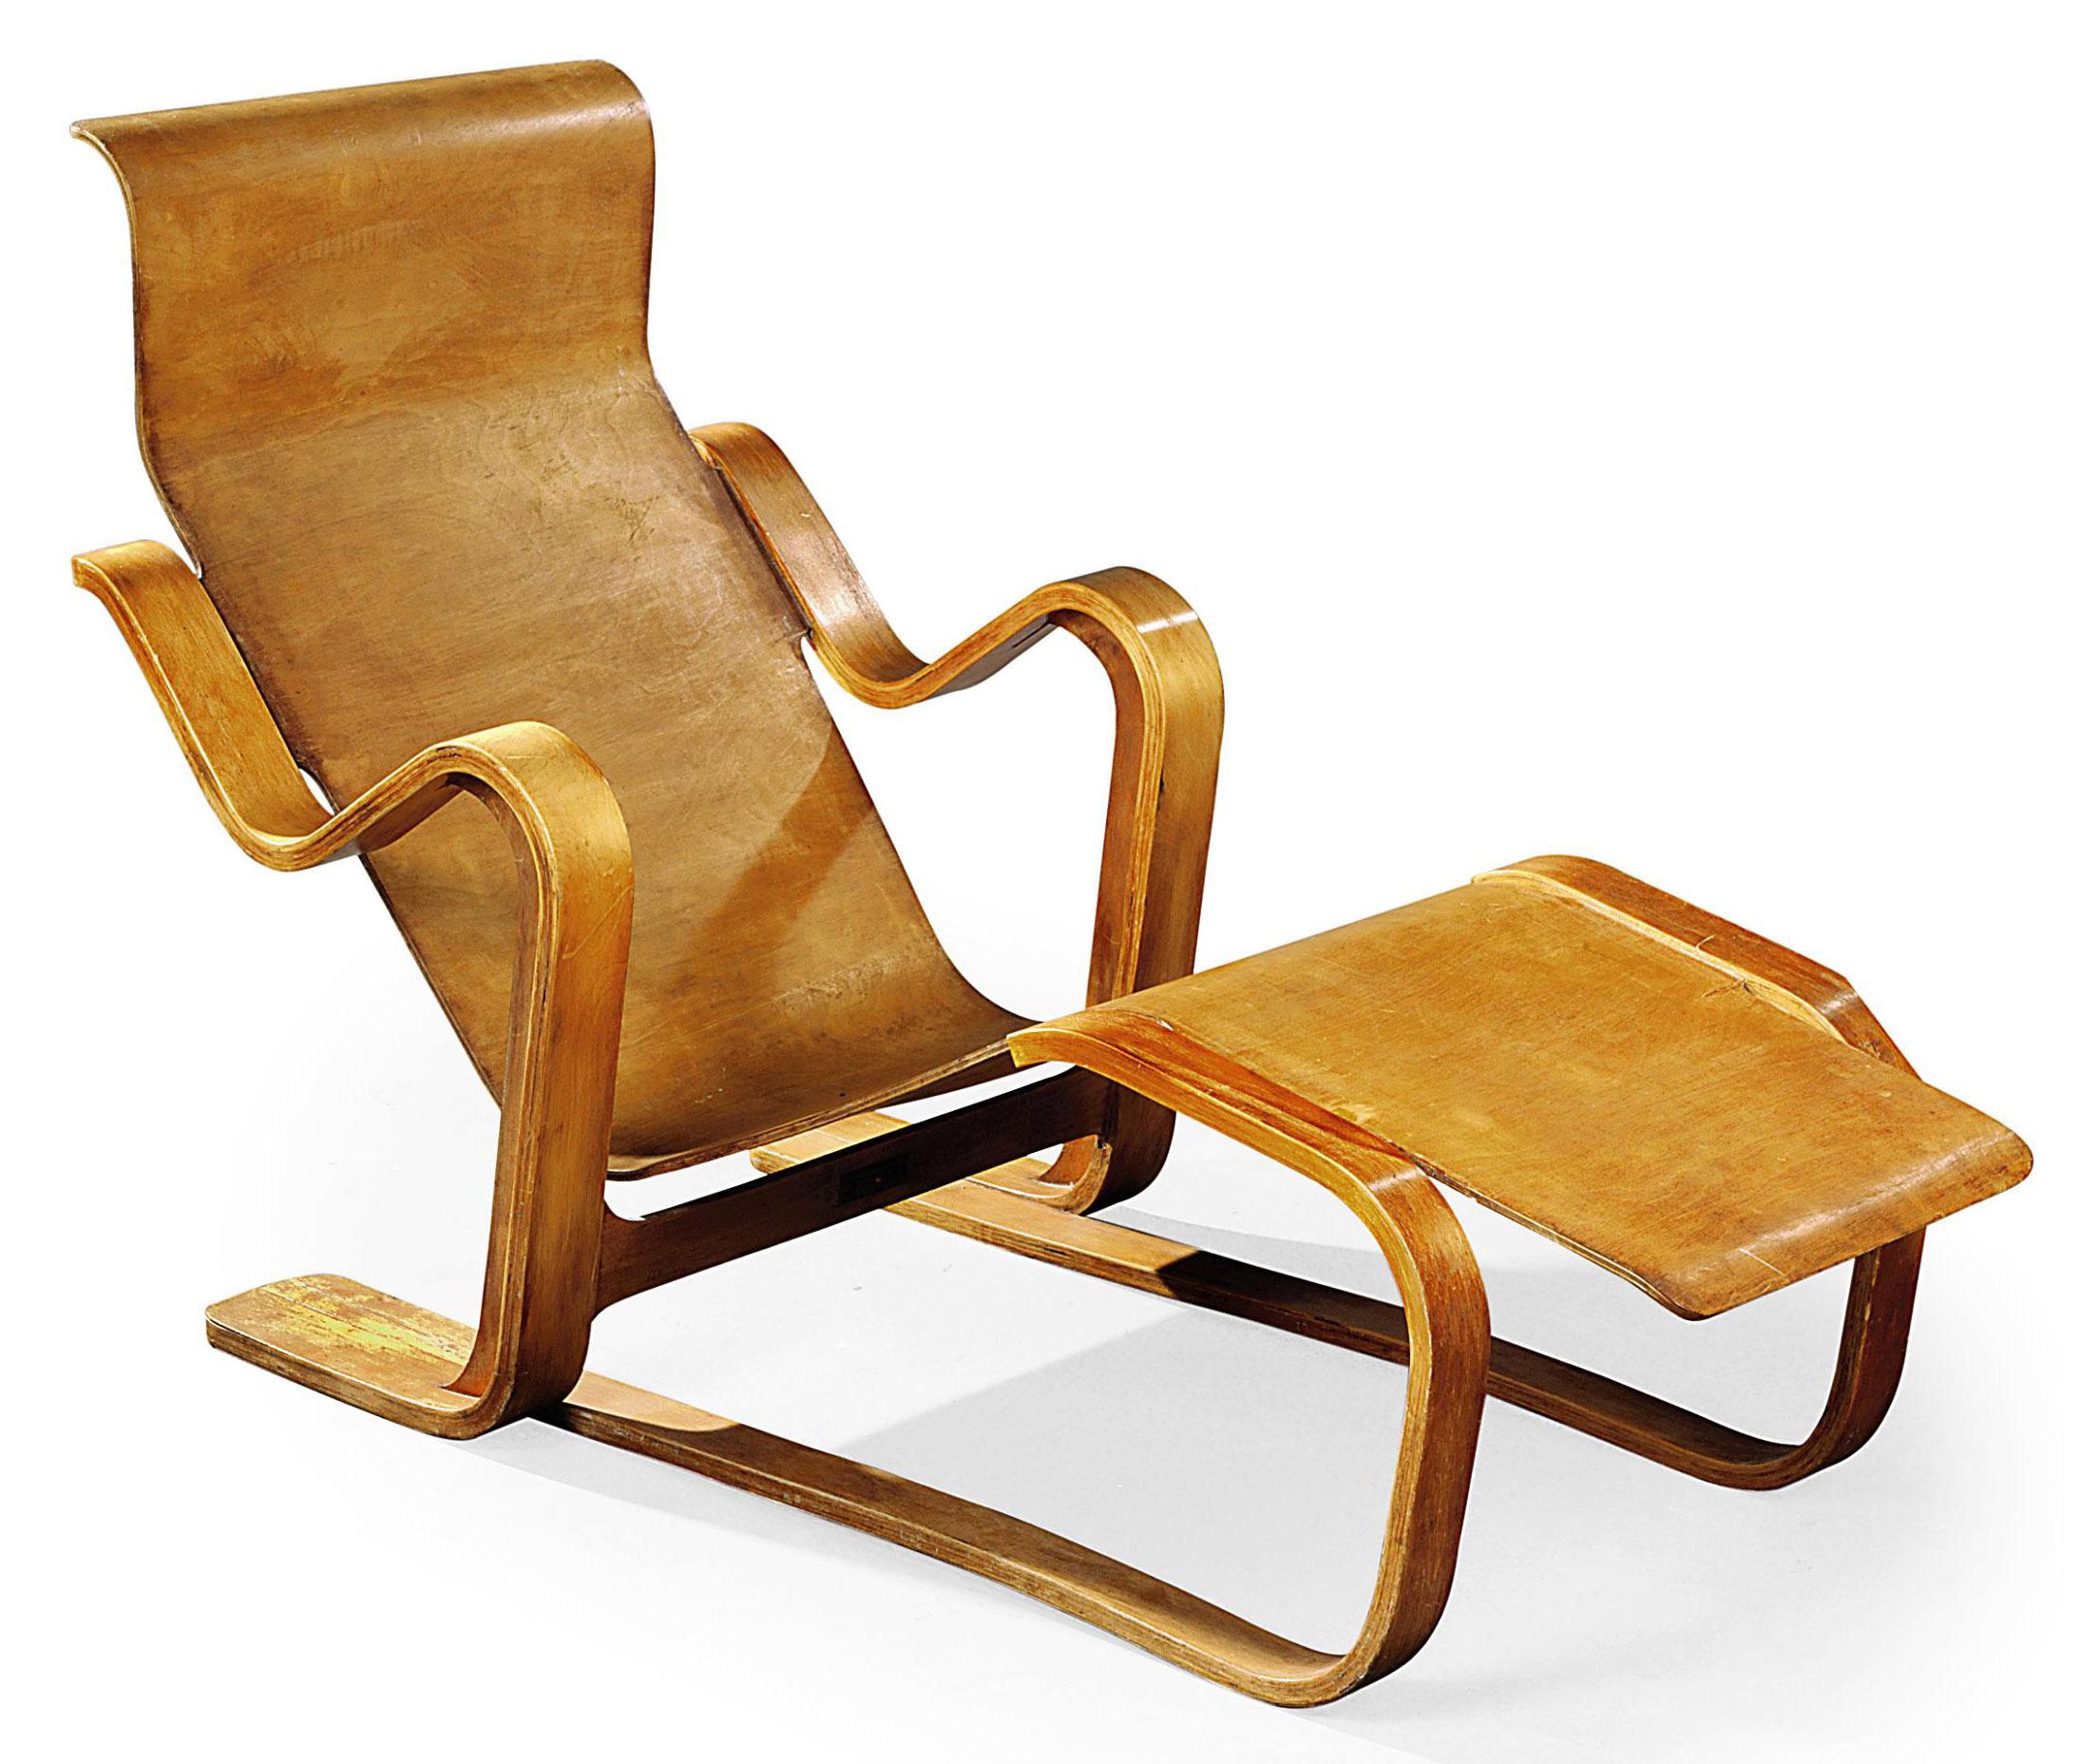 MARCEL BREUER 19021981 LONG CHAIR DESIGNED 1936 1930s